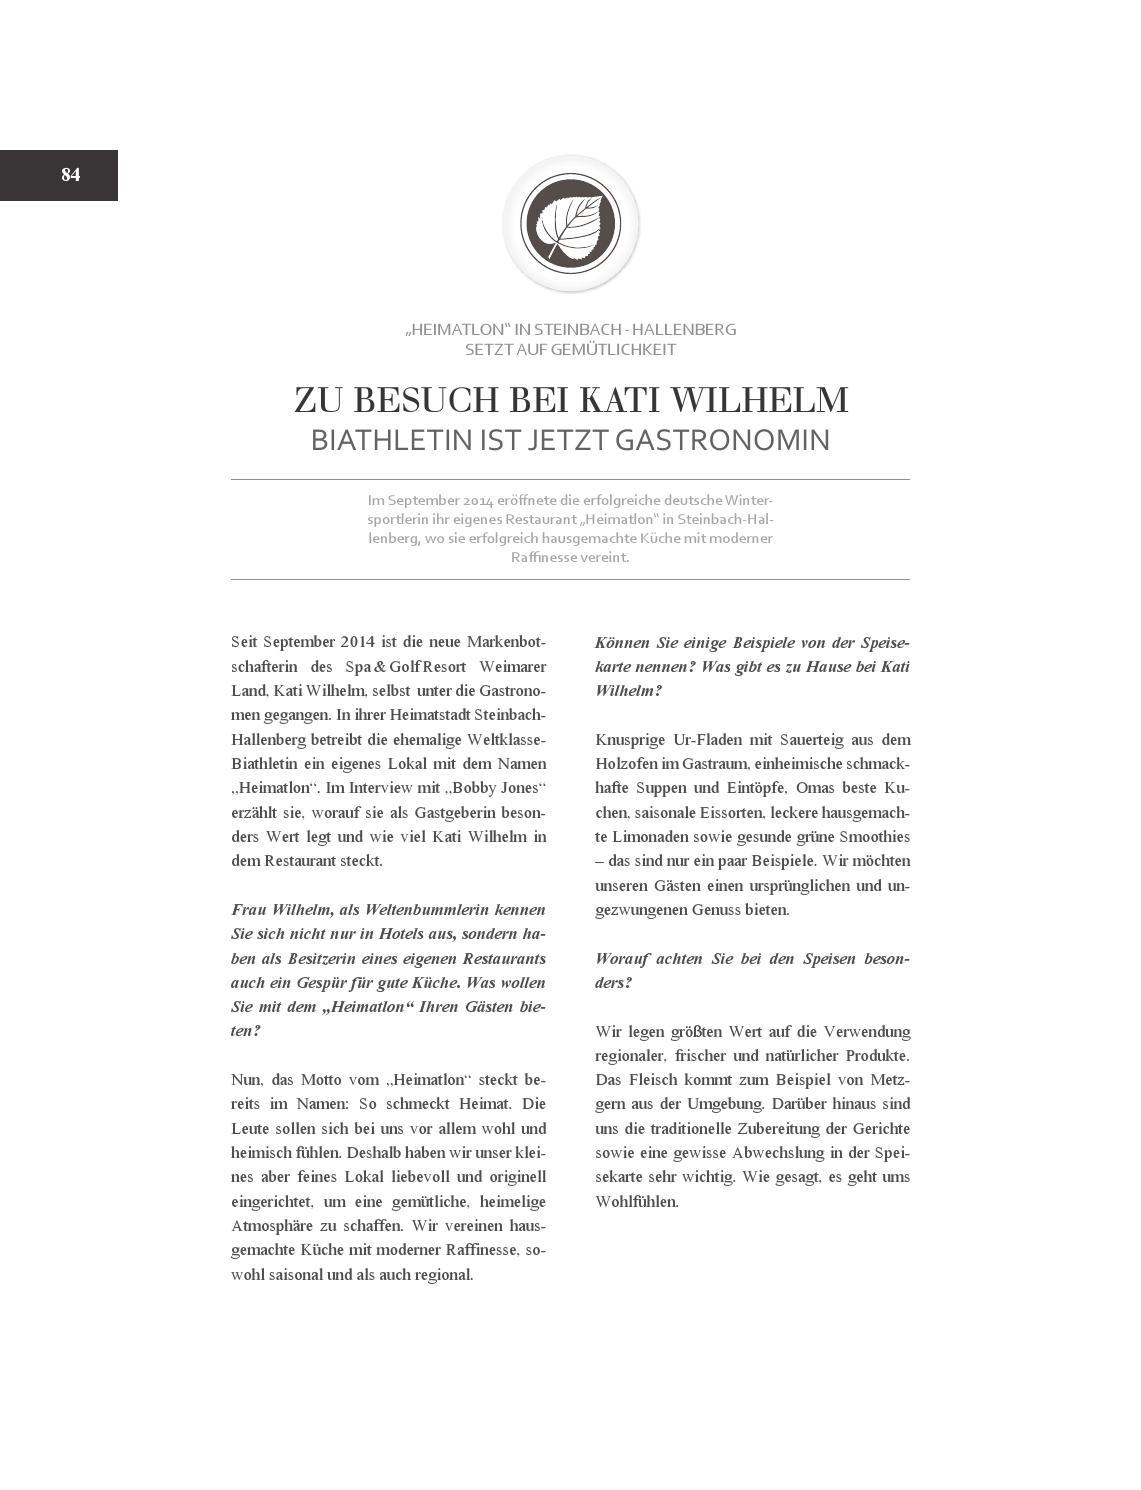 Bobby Jones Lifestylemagazin 2016 By Spa Golfresort Weimarer Land